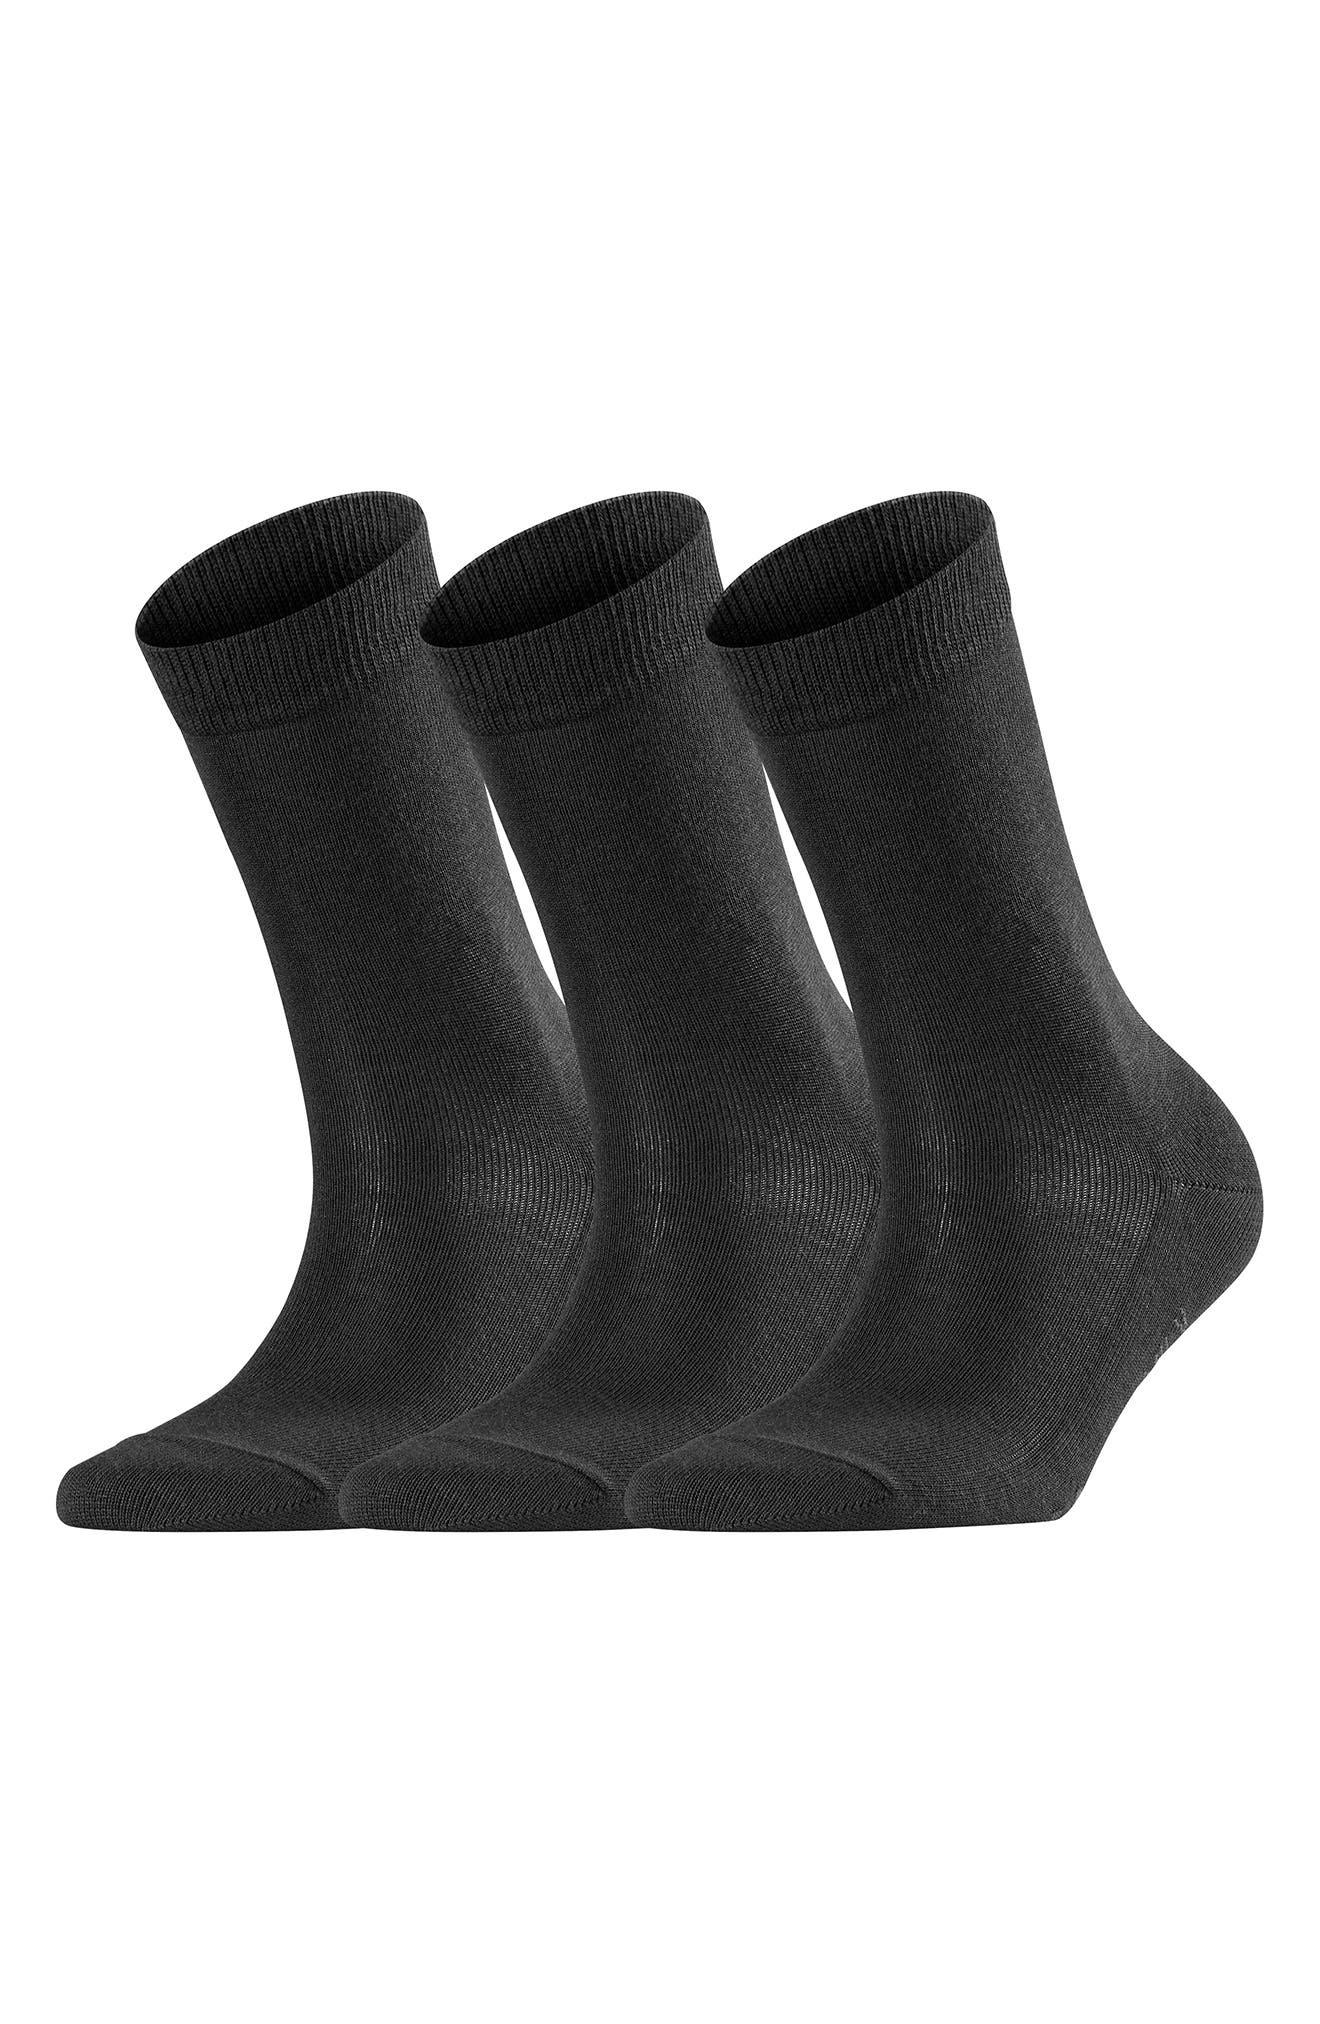 Falke Womens Finest No4 Camel and Silk Socks Dark Navy